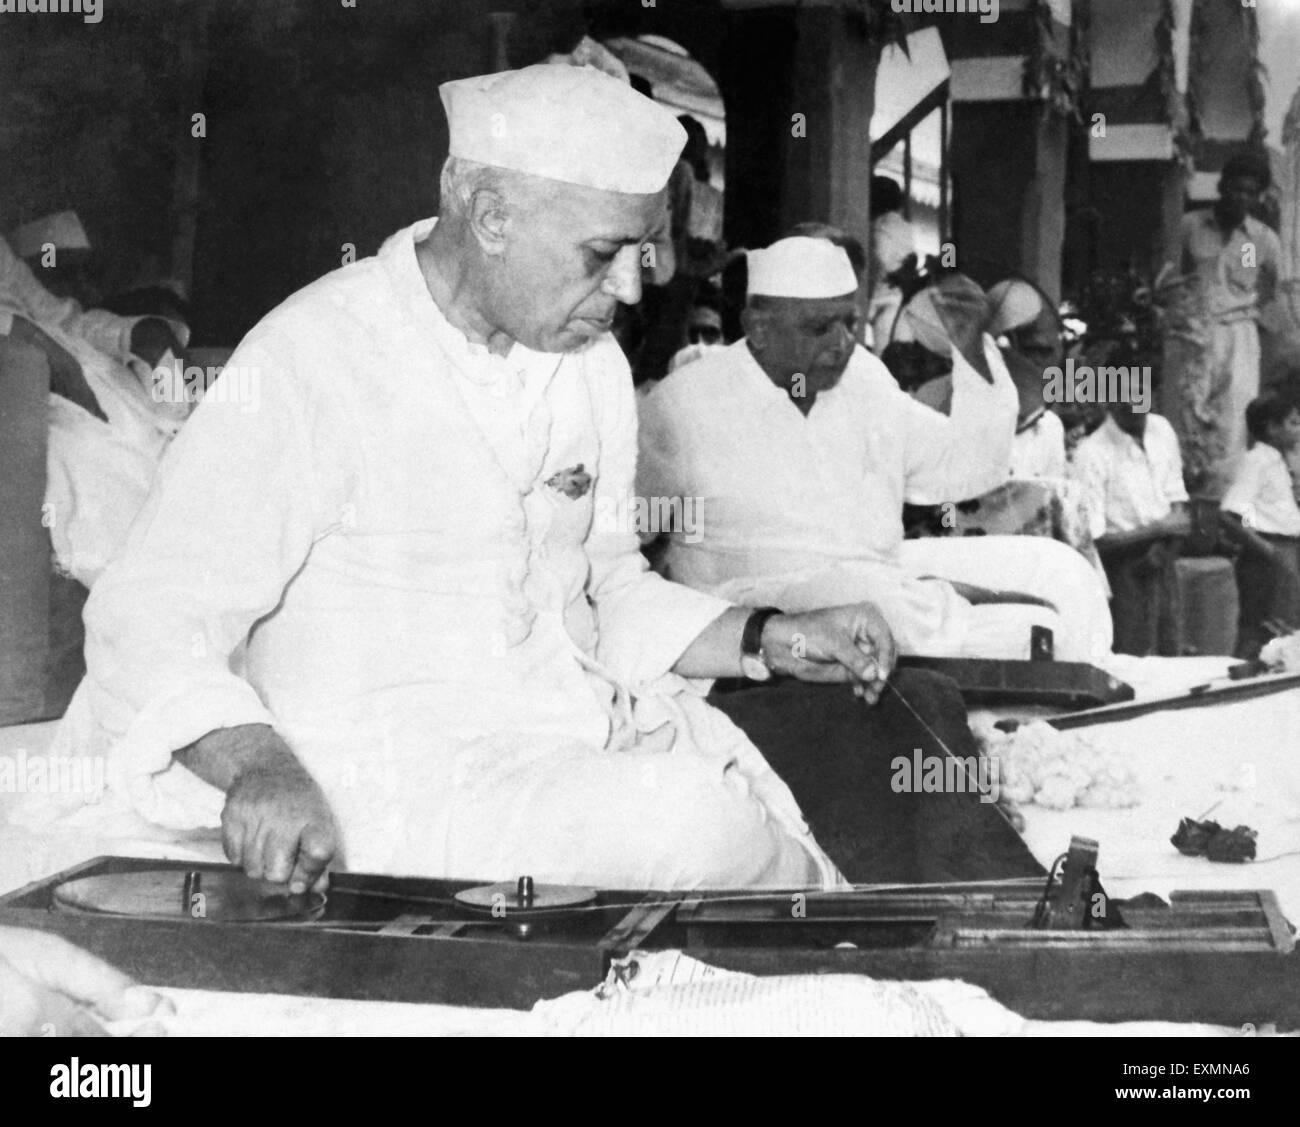 Jawaharlal Nehru spinning ; 1945 ; India - Stock Image